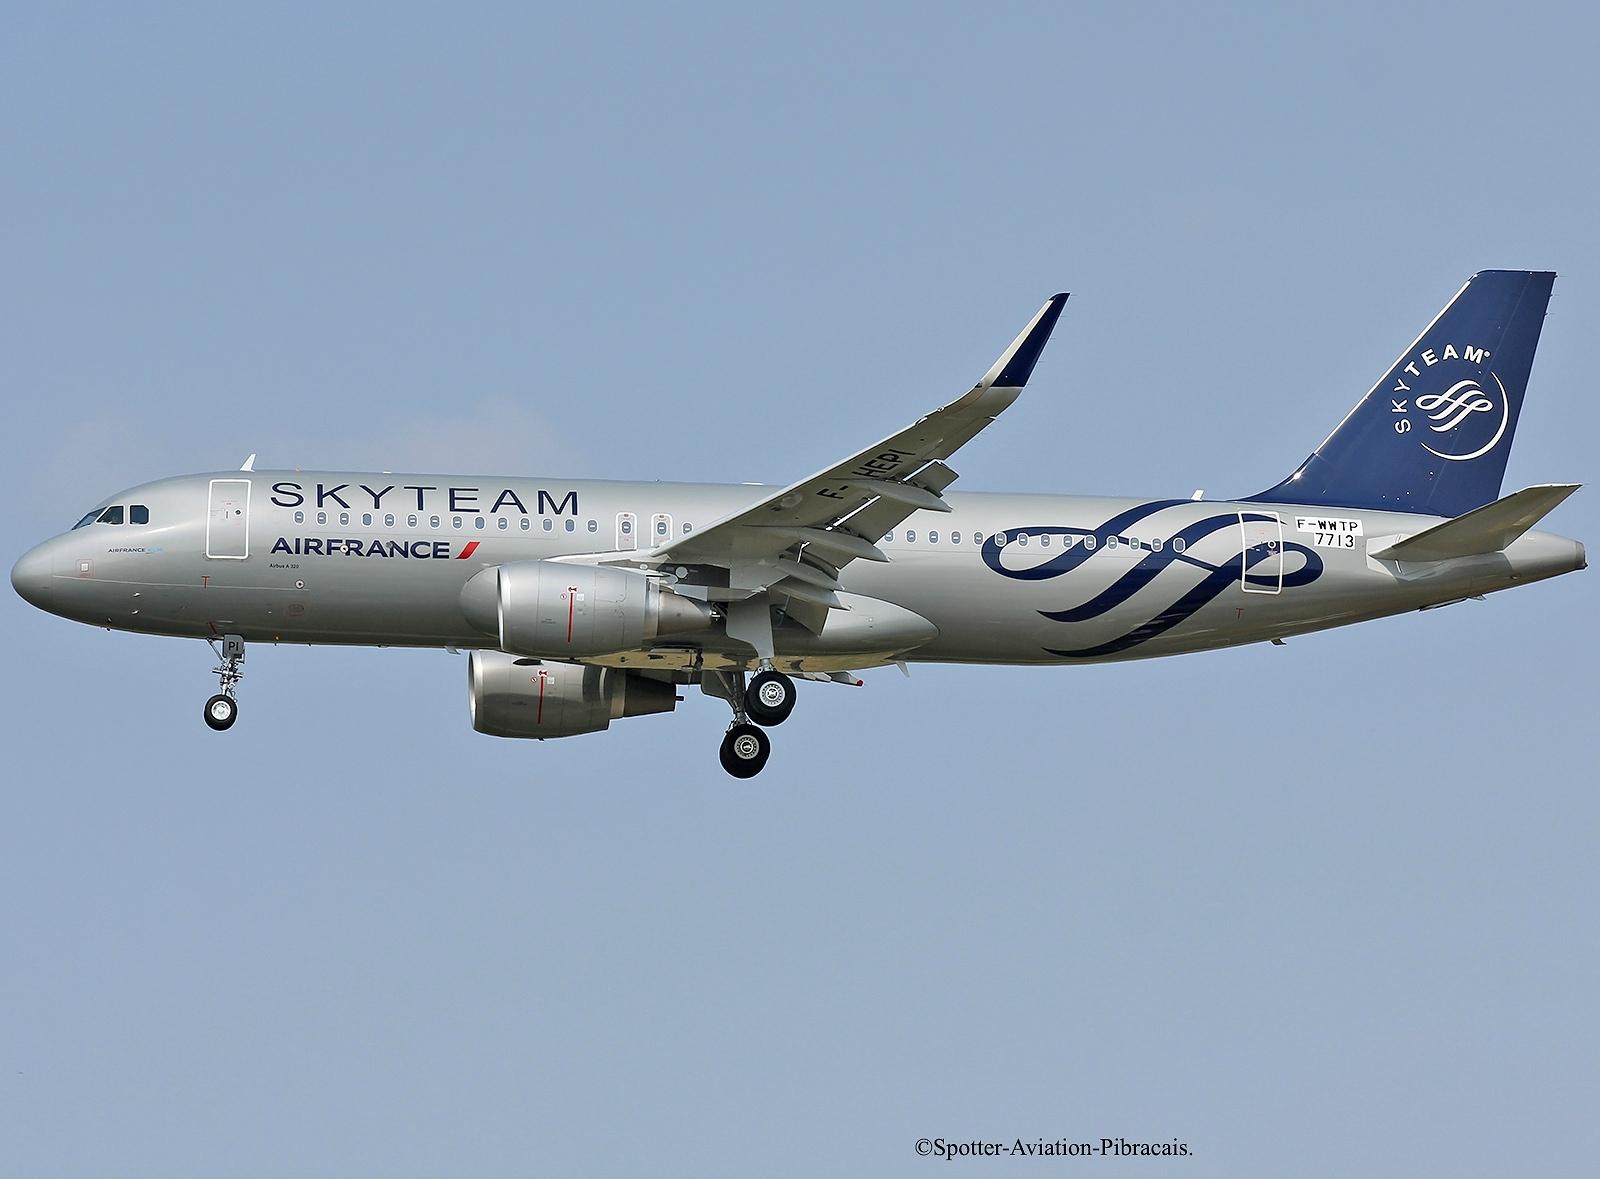 Air France (SKYTEAM)